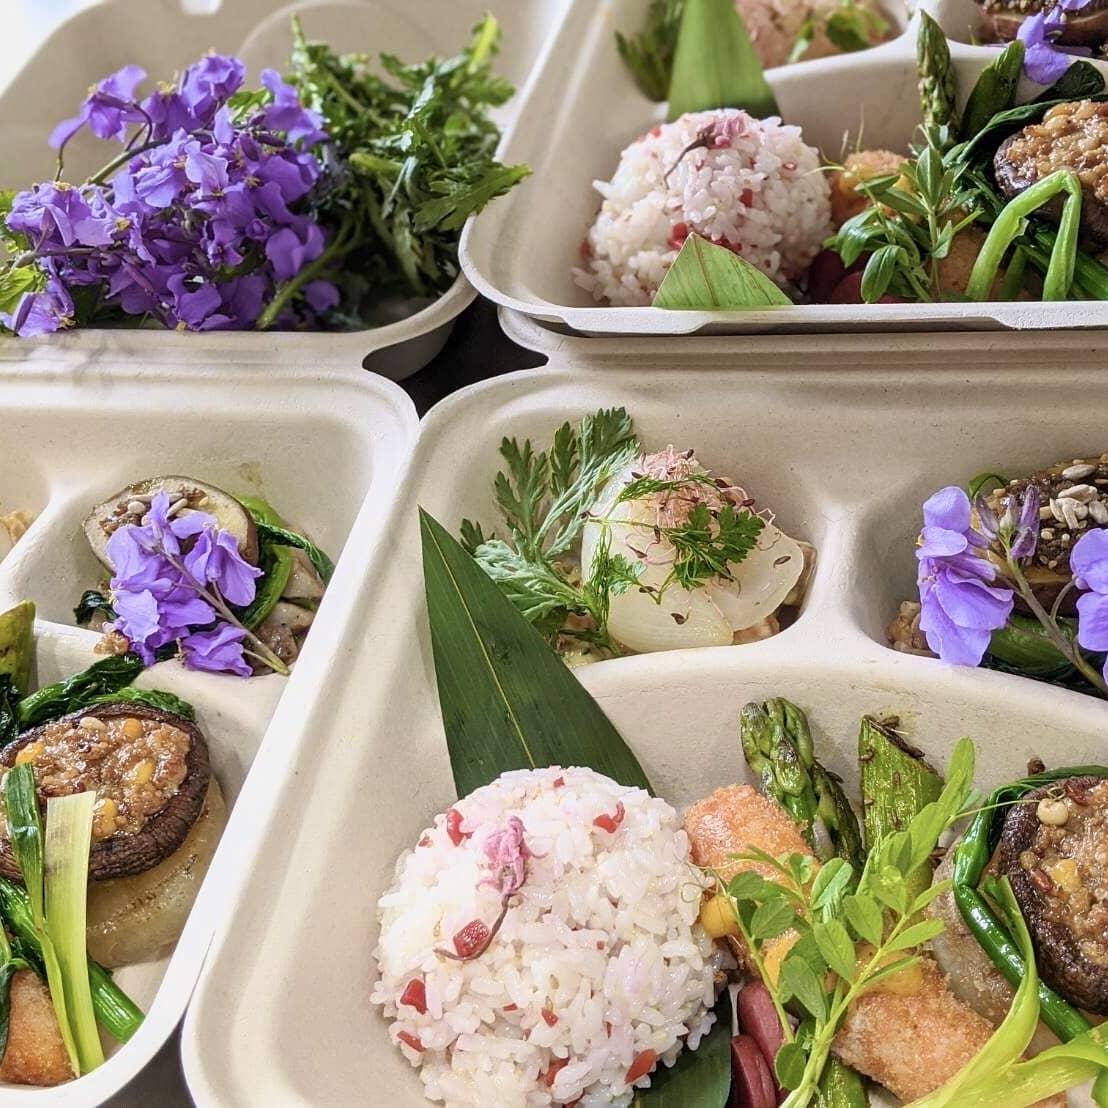 camecame30,春日部,自然食,お弁当,テイクアウト